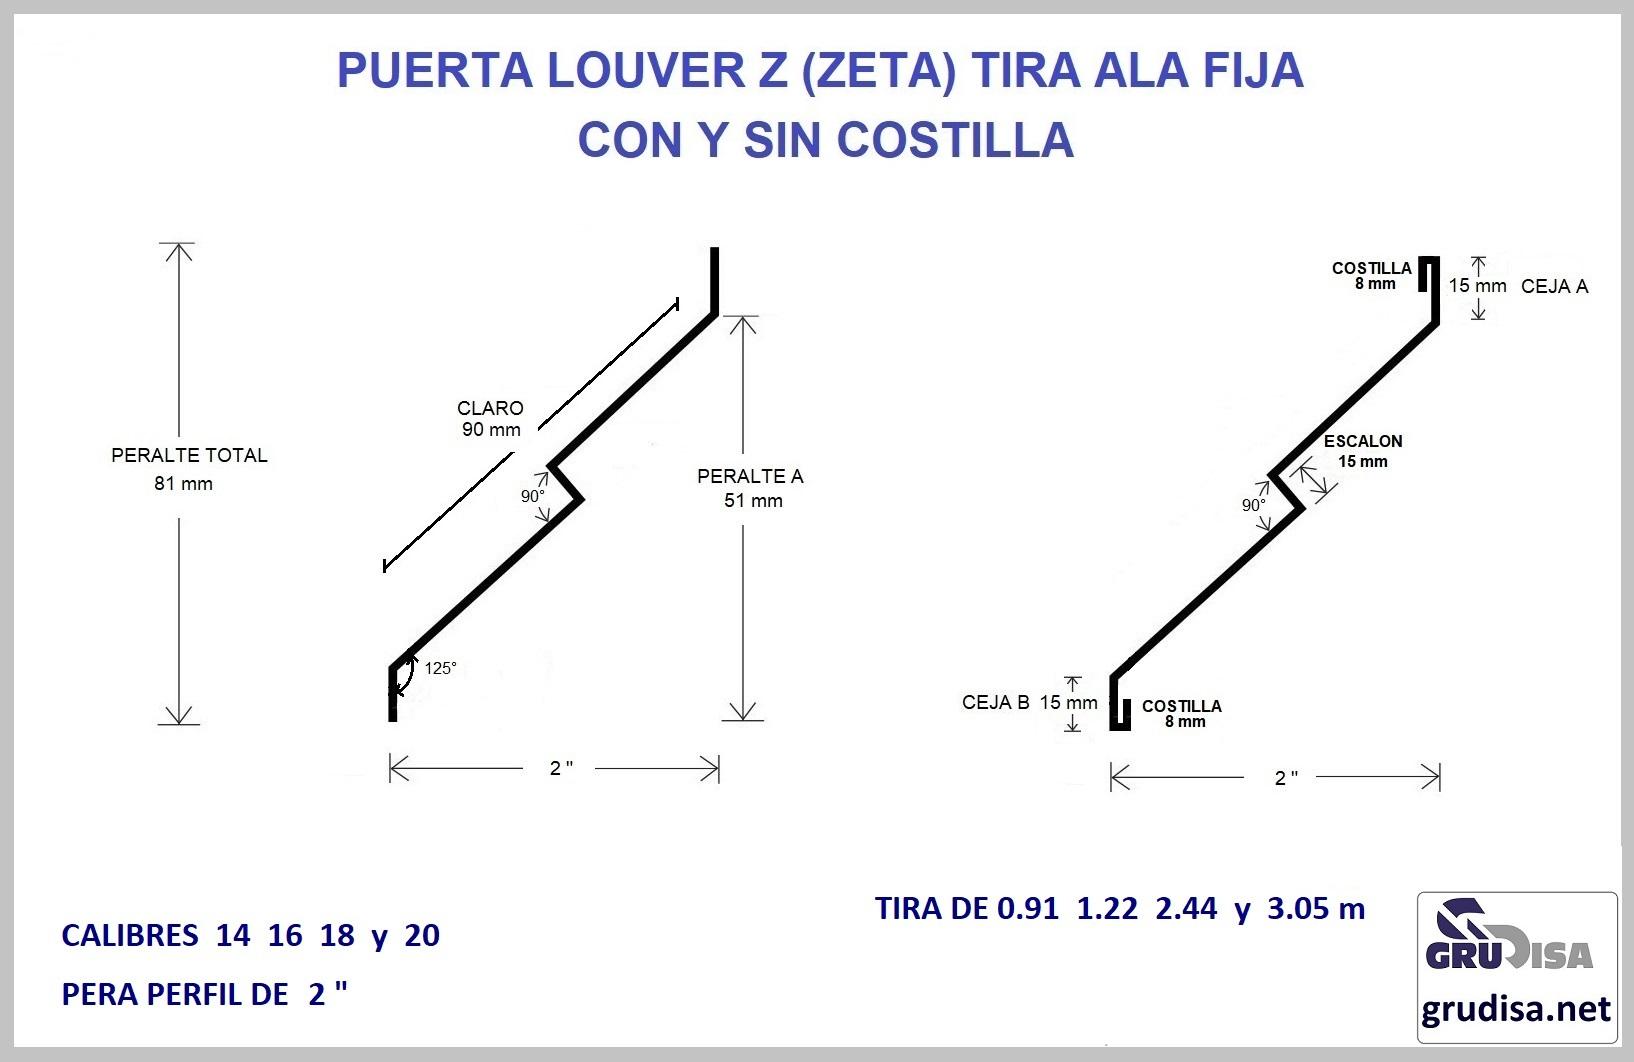 "PUERTA LOUVER Z (TIRA) PERFIL DE 2"""